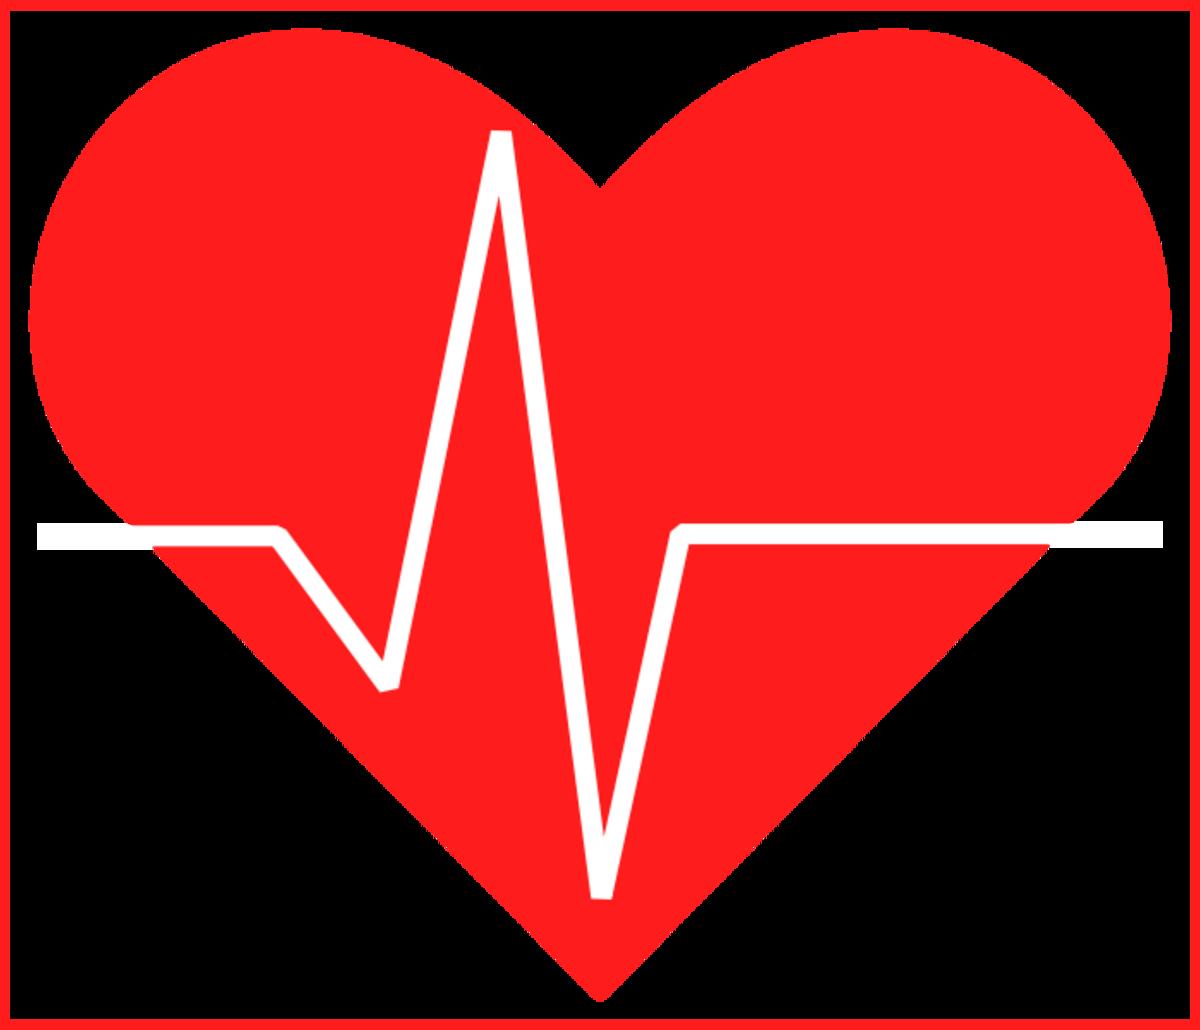 A heart with a white EKG peak superimposed